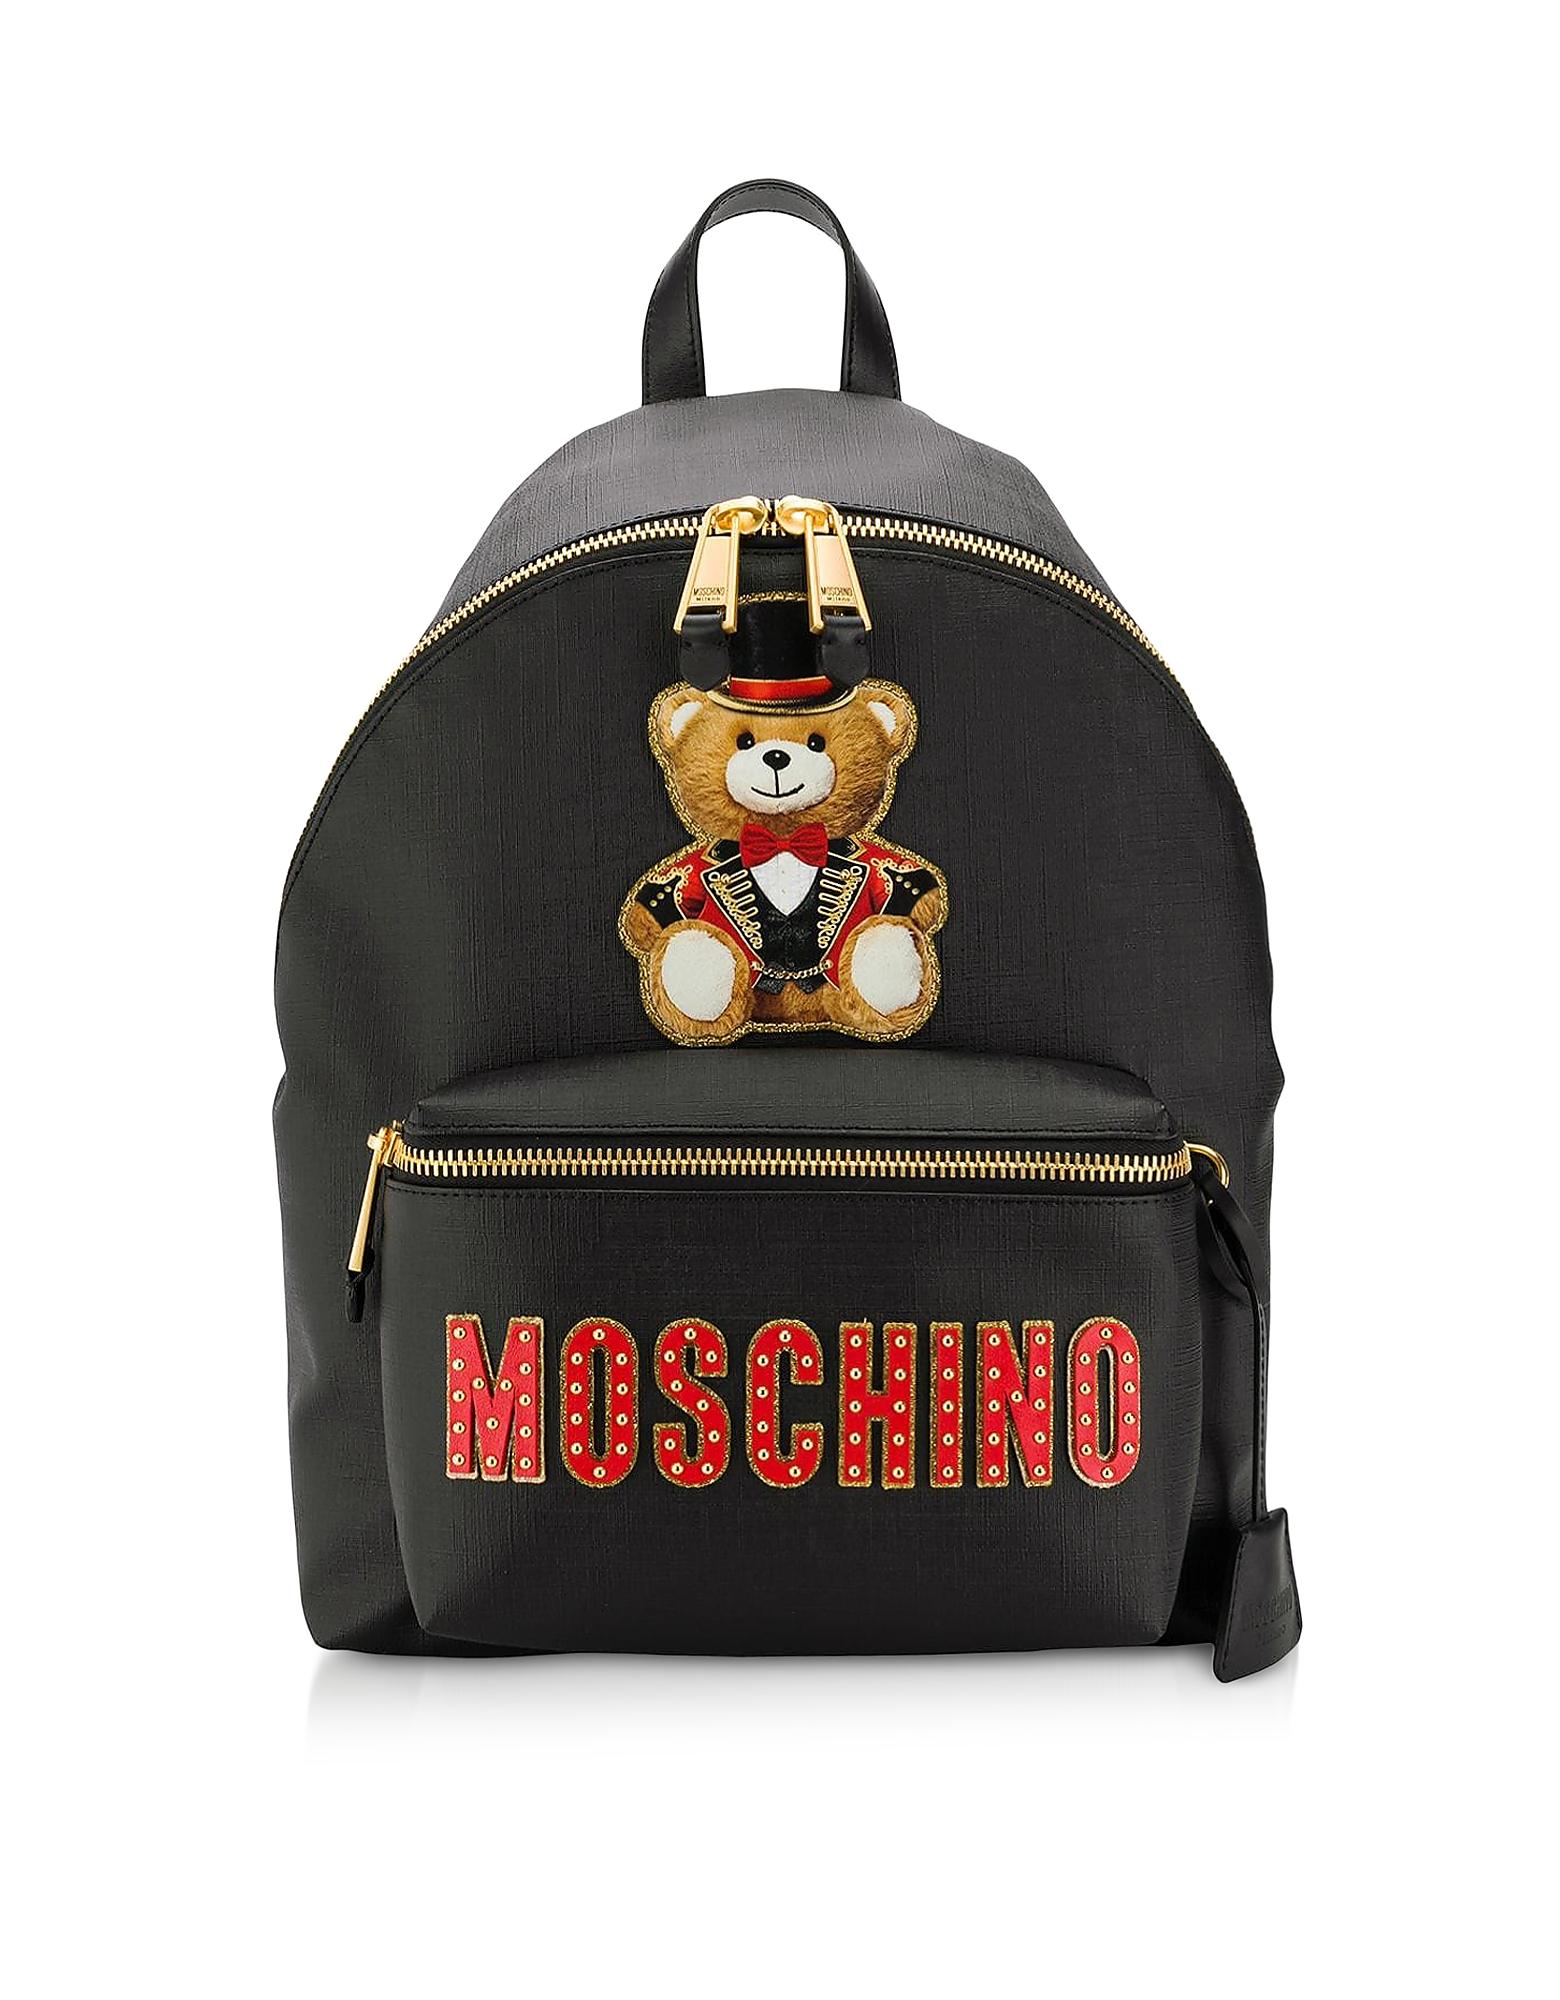 Black Teddy Bear Backpack W&Teddy Circus Patch